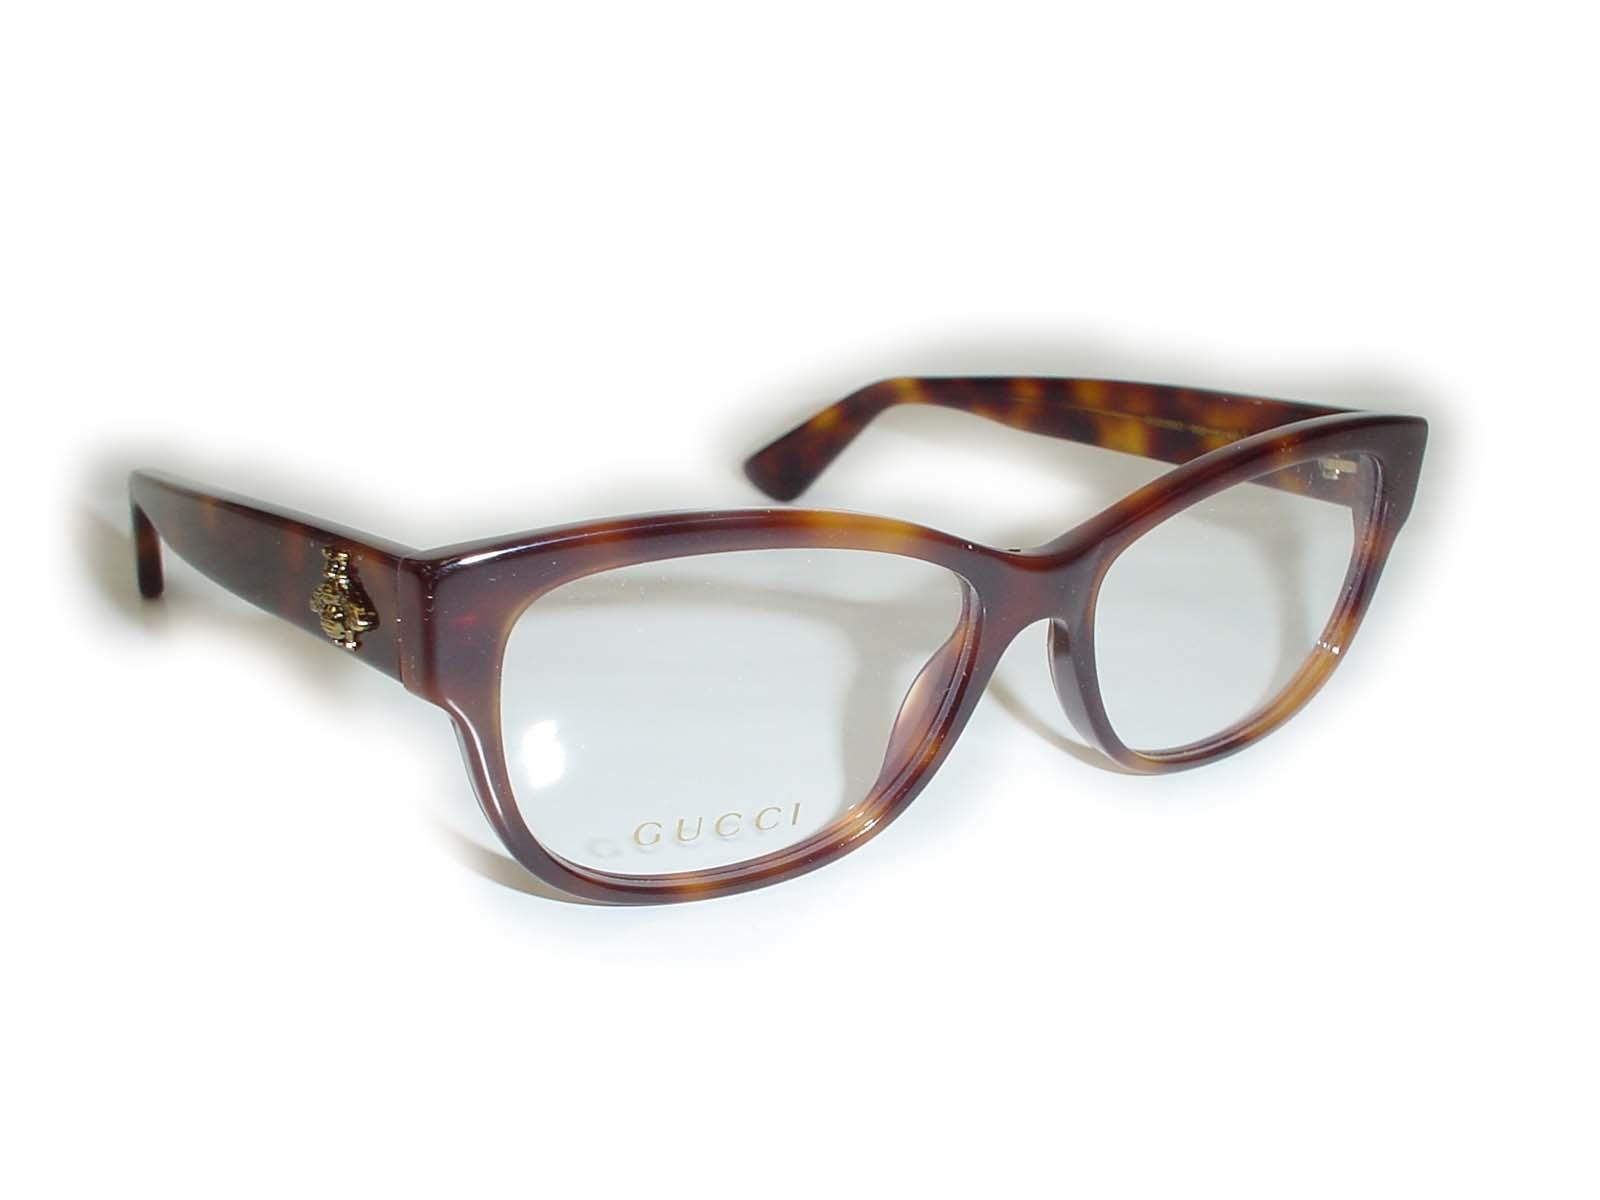 ★★GUCCI★★ GG0098O 53□15-140 002 ブラウン超薄型非球面レンズ付グッチ メガネ